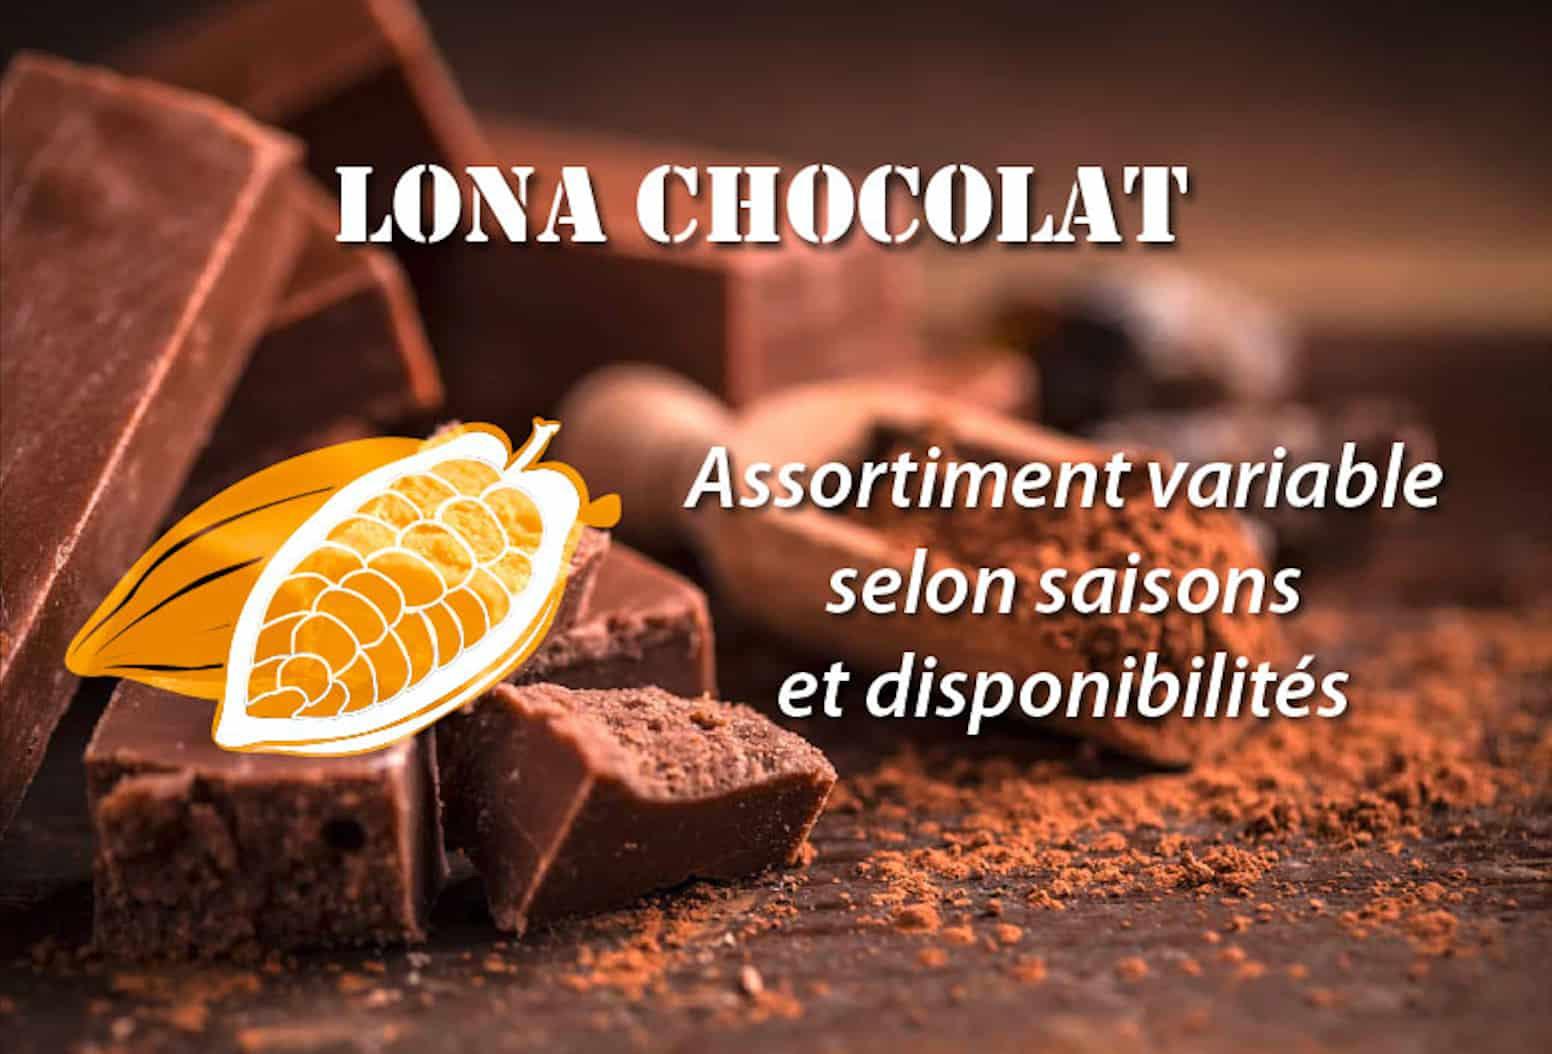 lona-chocolat